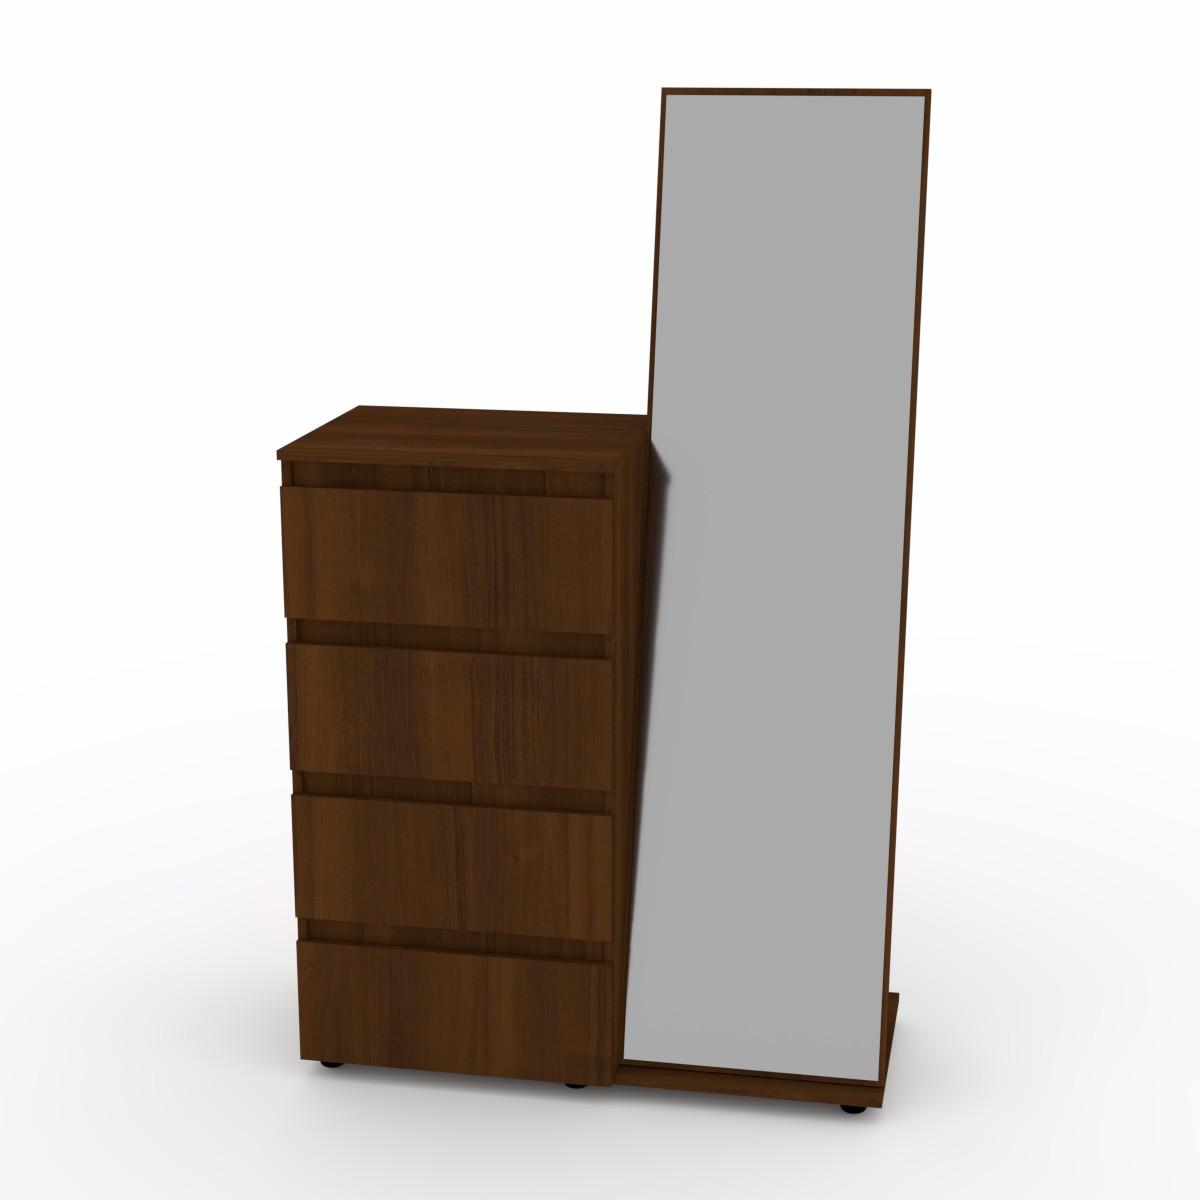 Комод с зеркалом орех экко Компанит (100х45х166 см)